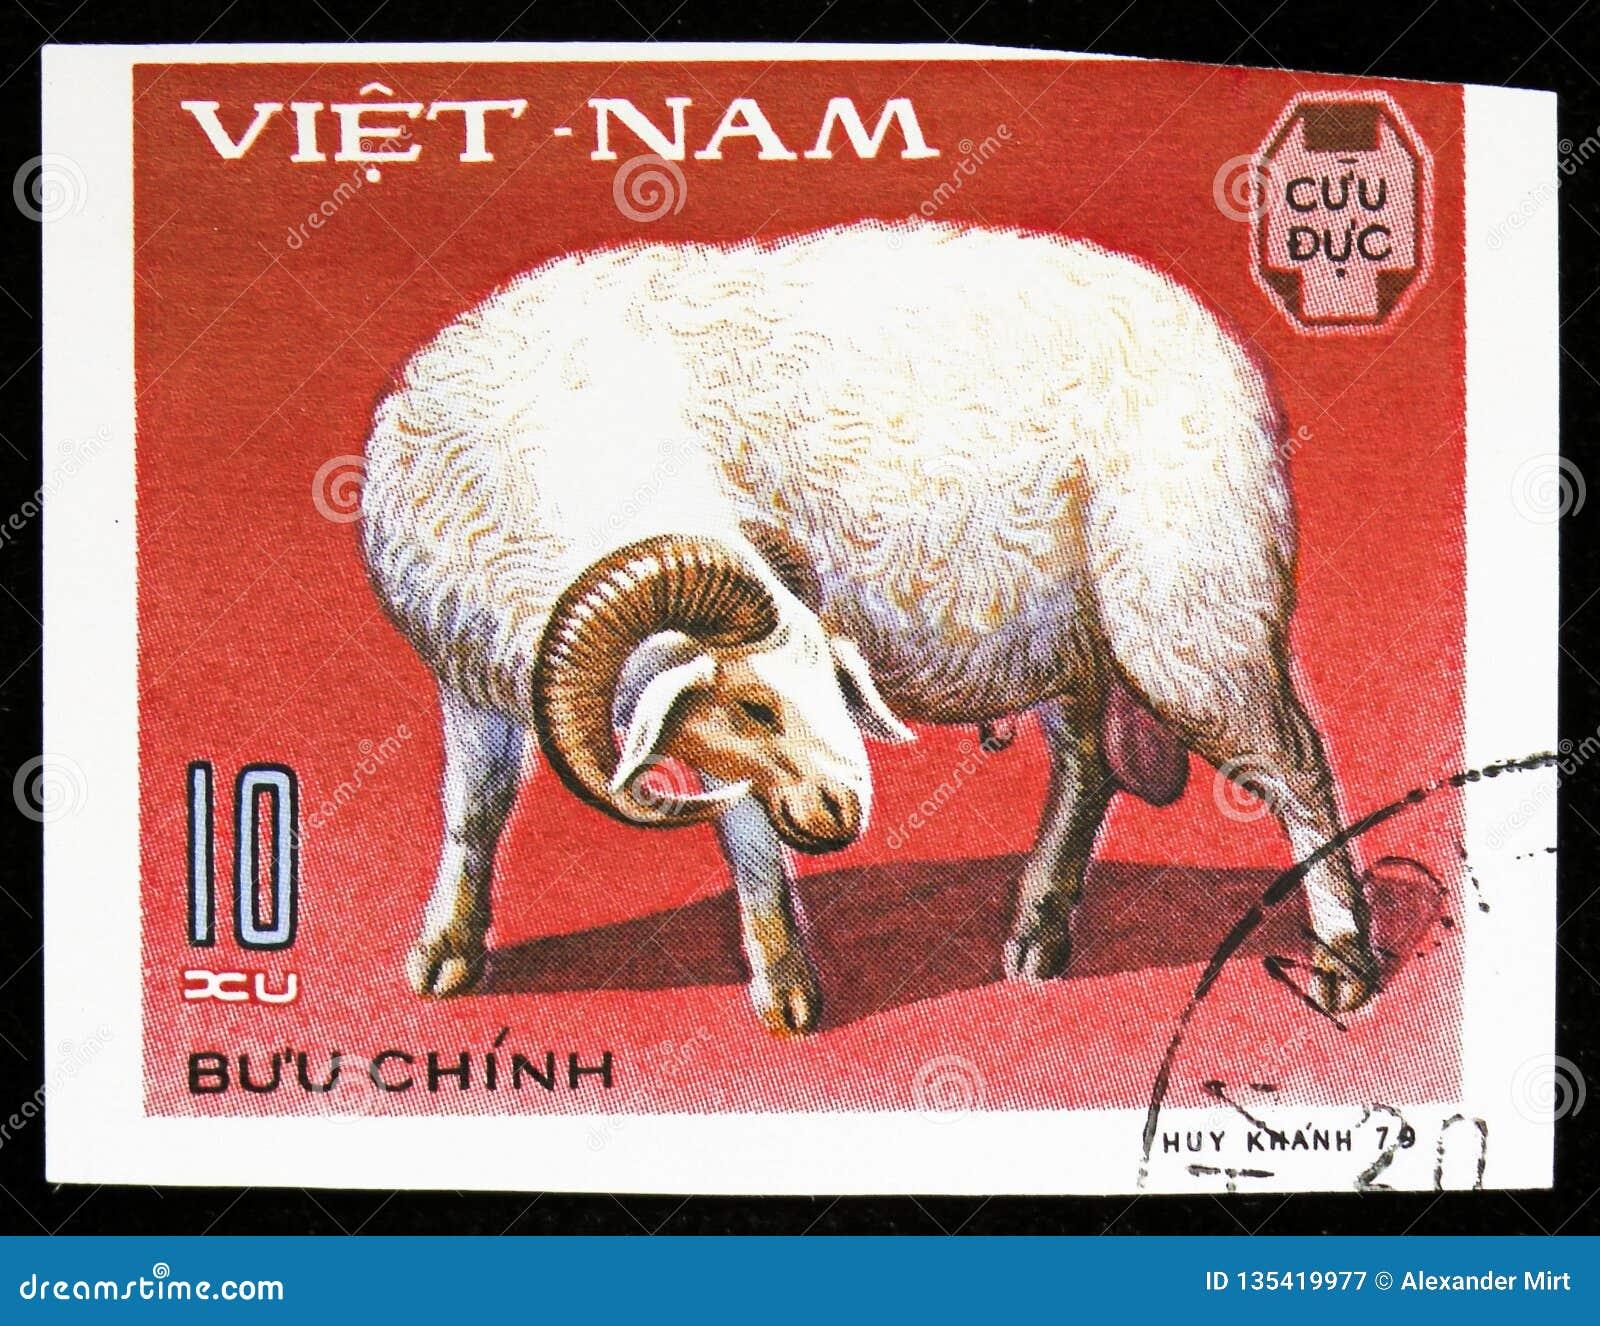 Ram Ovis ammon aries, Domestic horned animals serie, circa 1979